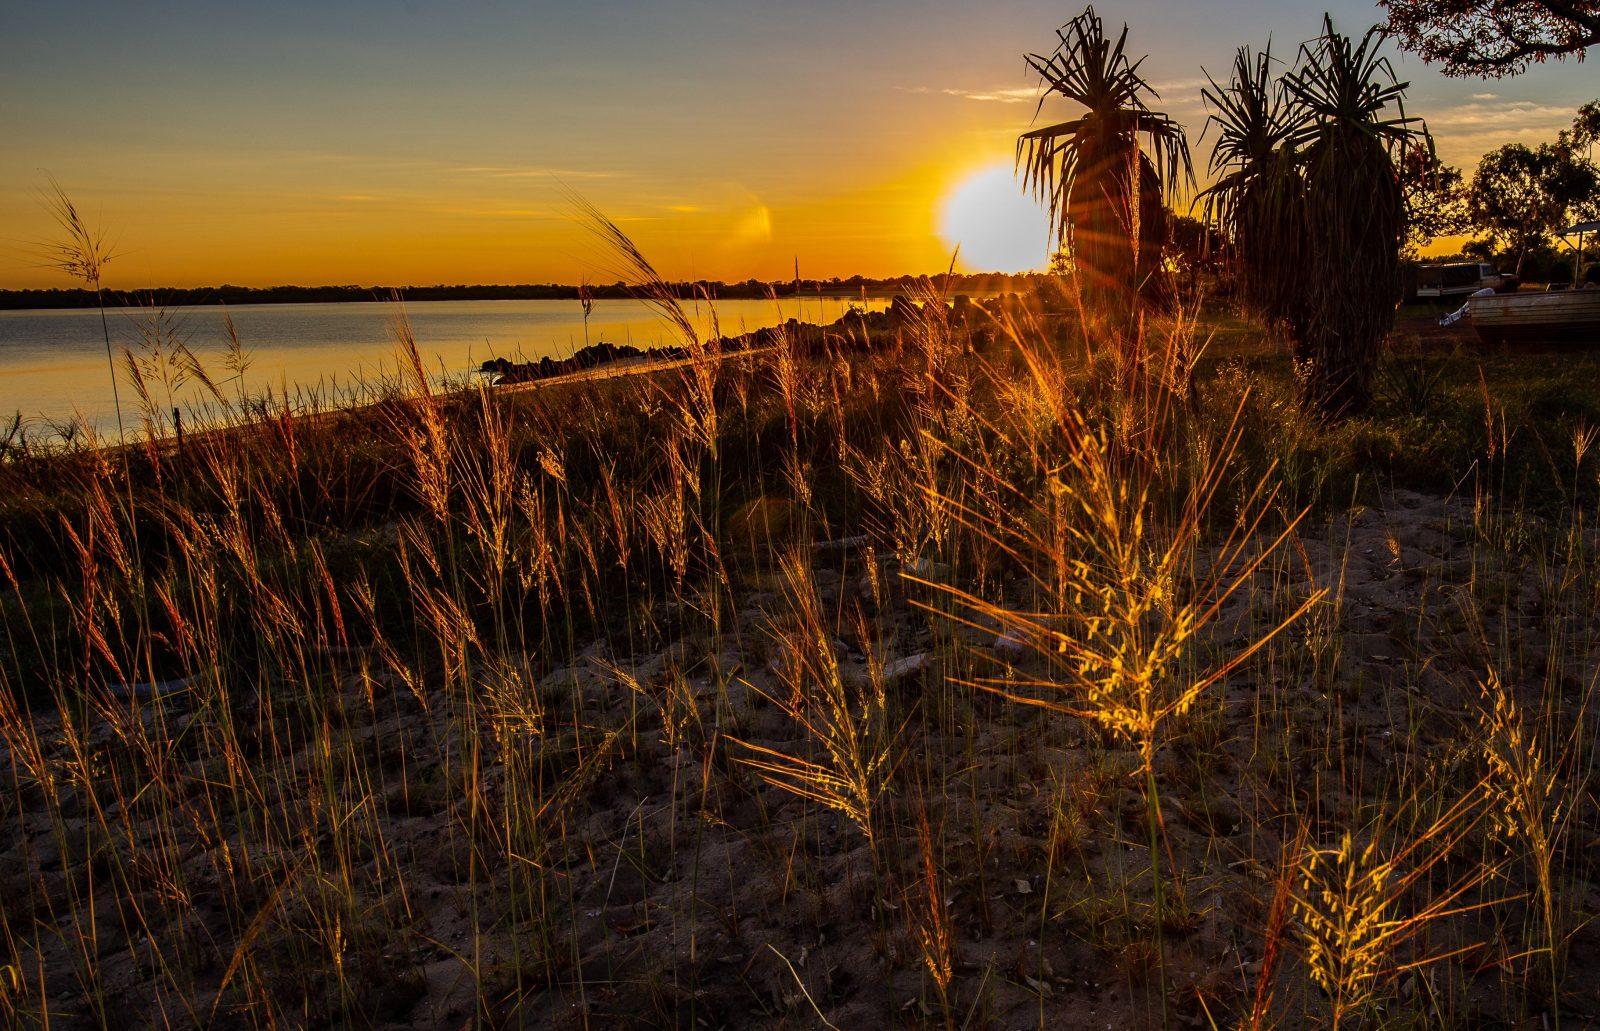 Honeymoon Bay, Kalumburu, Western Australia